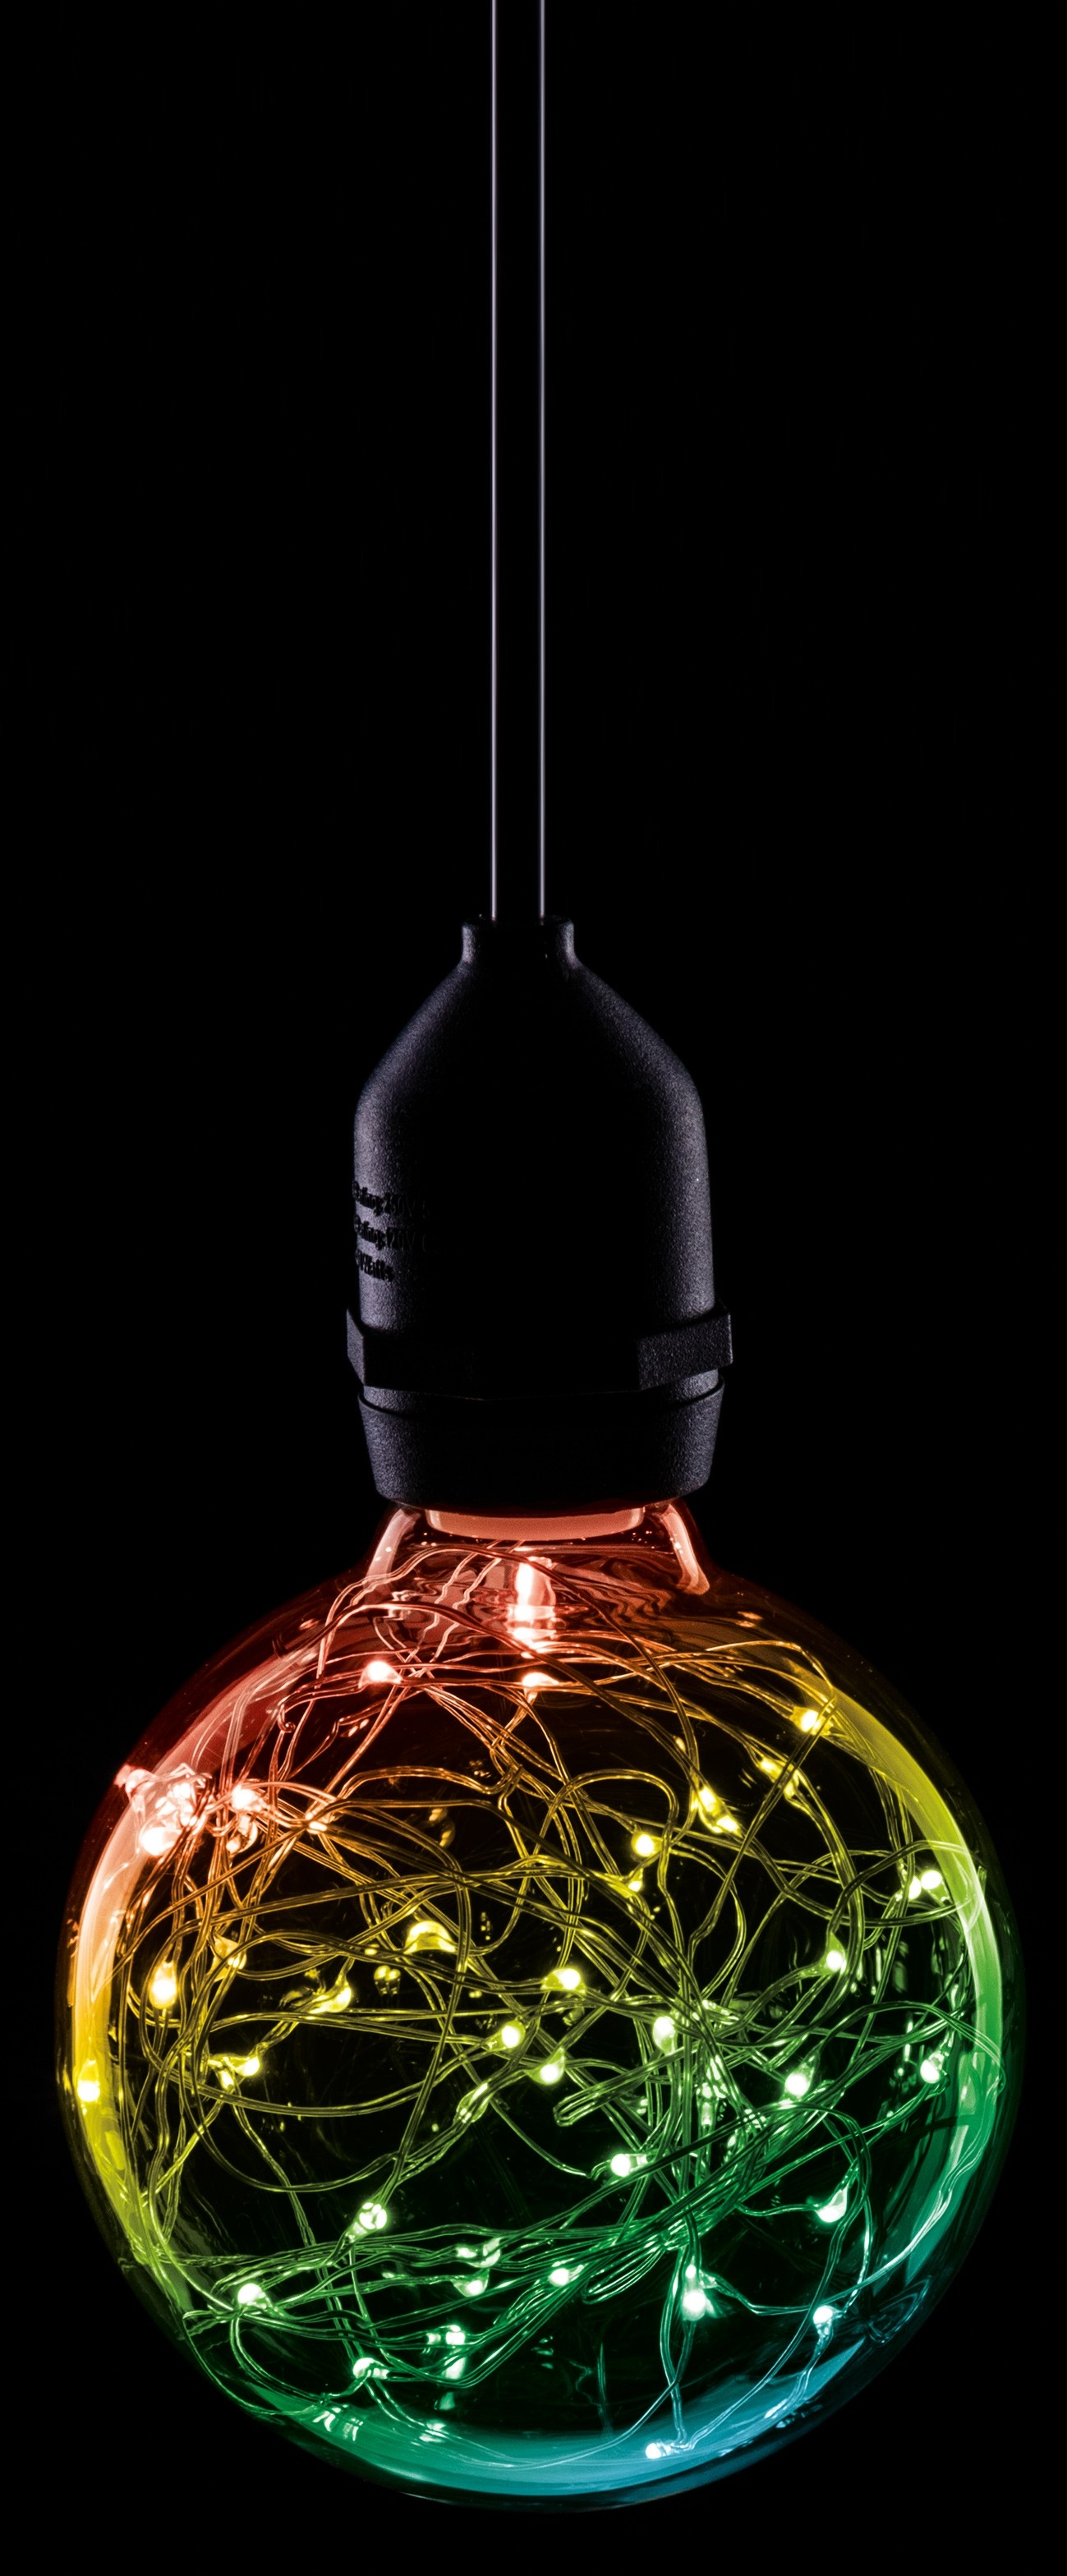 LED 95MM STAR EFFECT GLOBE 1.7W RGB BC